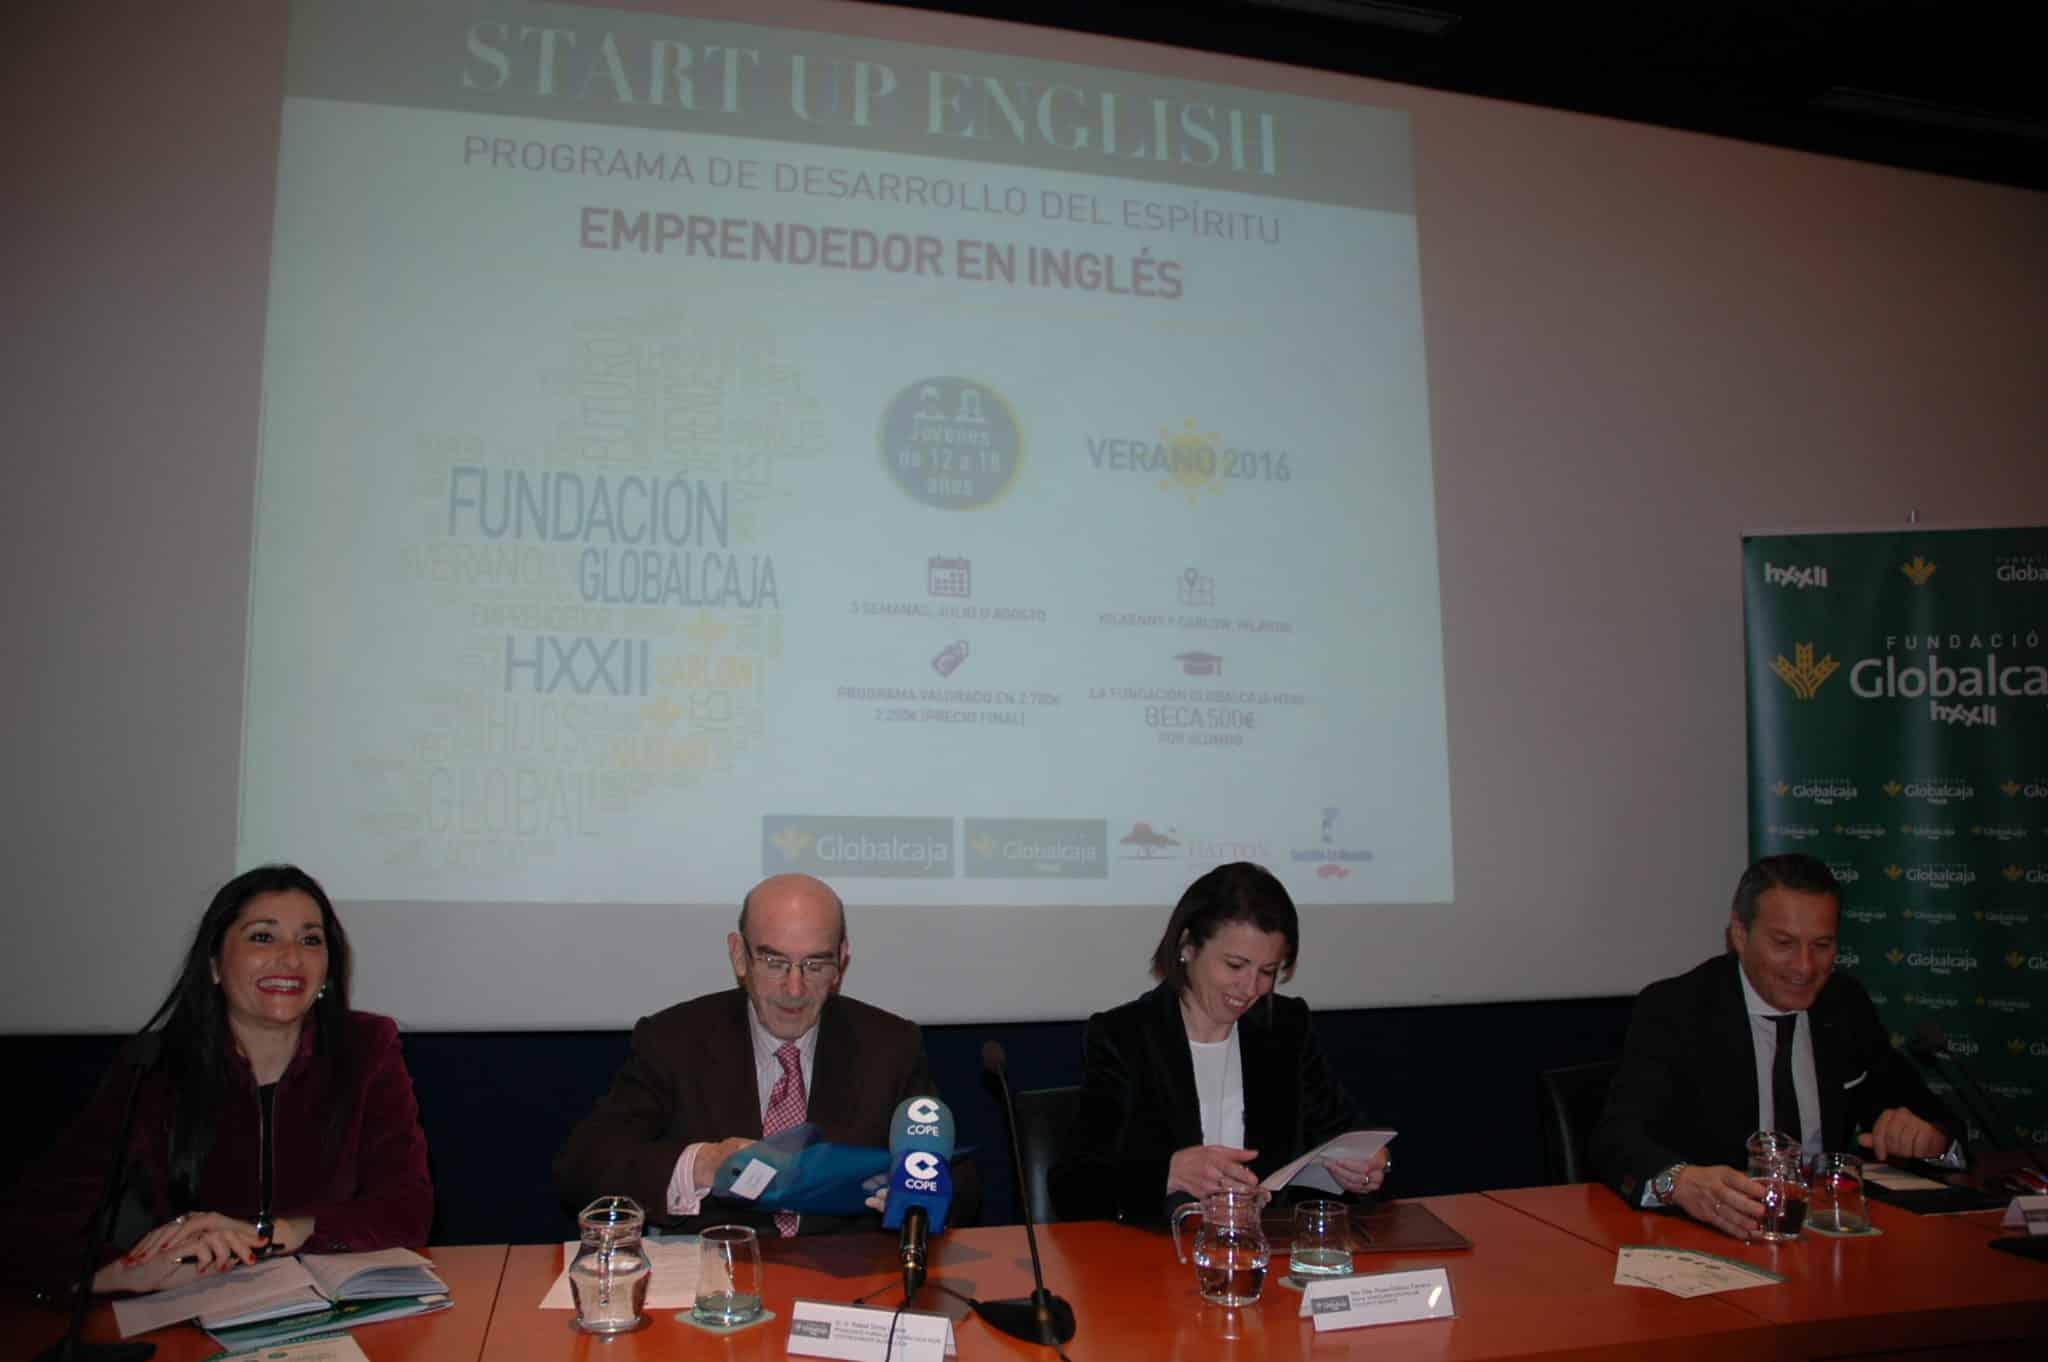 https://blog.globalcaja.es/wp-content/uploads/2016/02/start-up.jpg